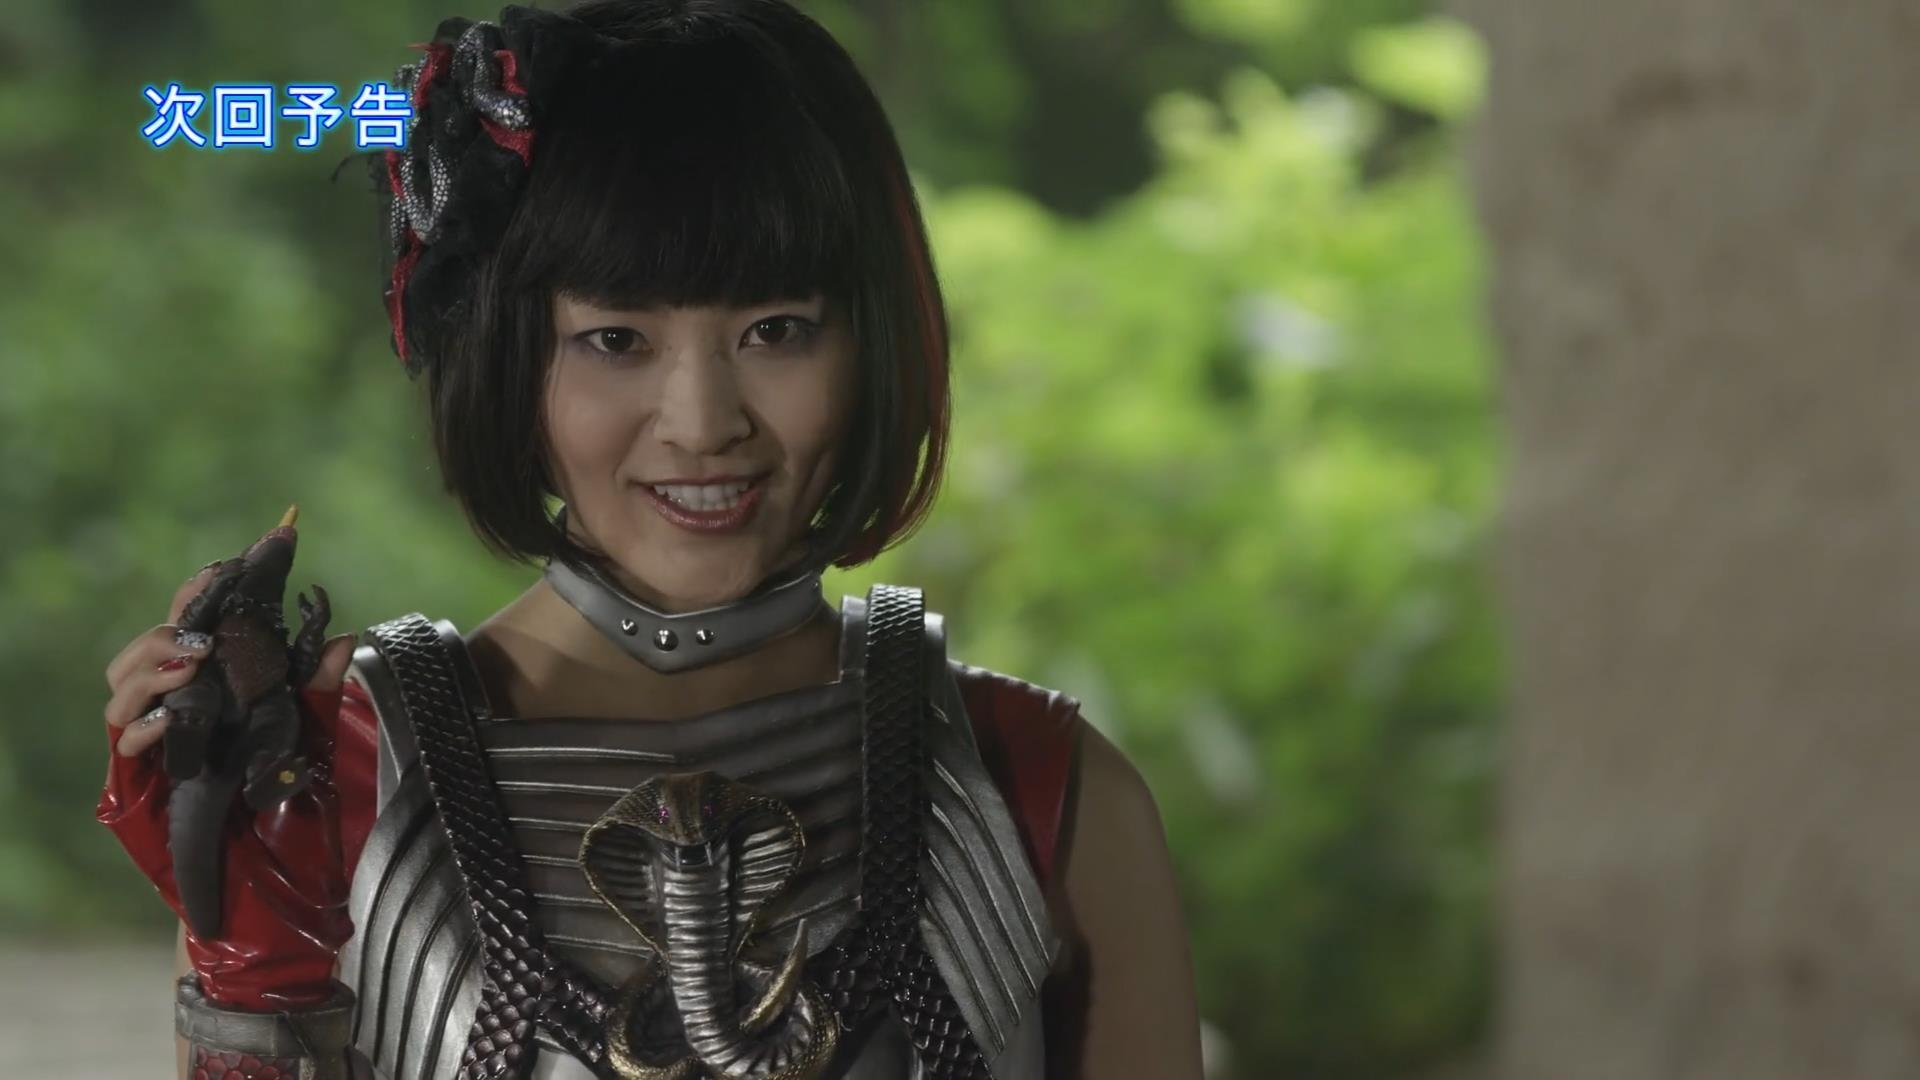 Kamen Rider Marika, Minami Tsukui, to Appear in Ultraman X